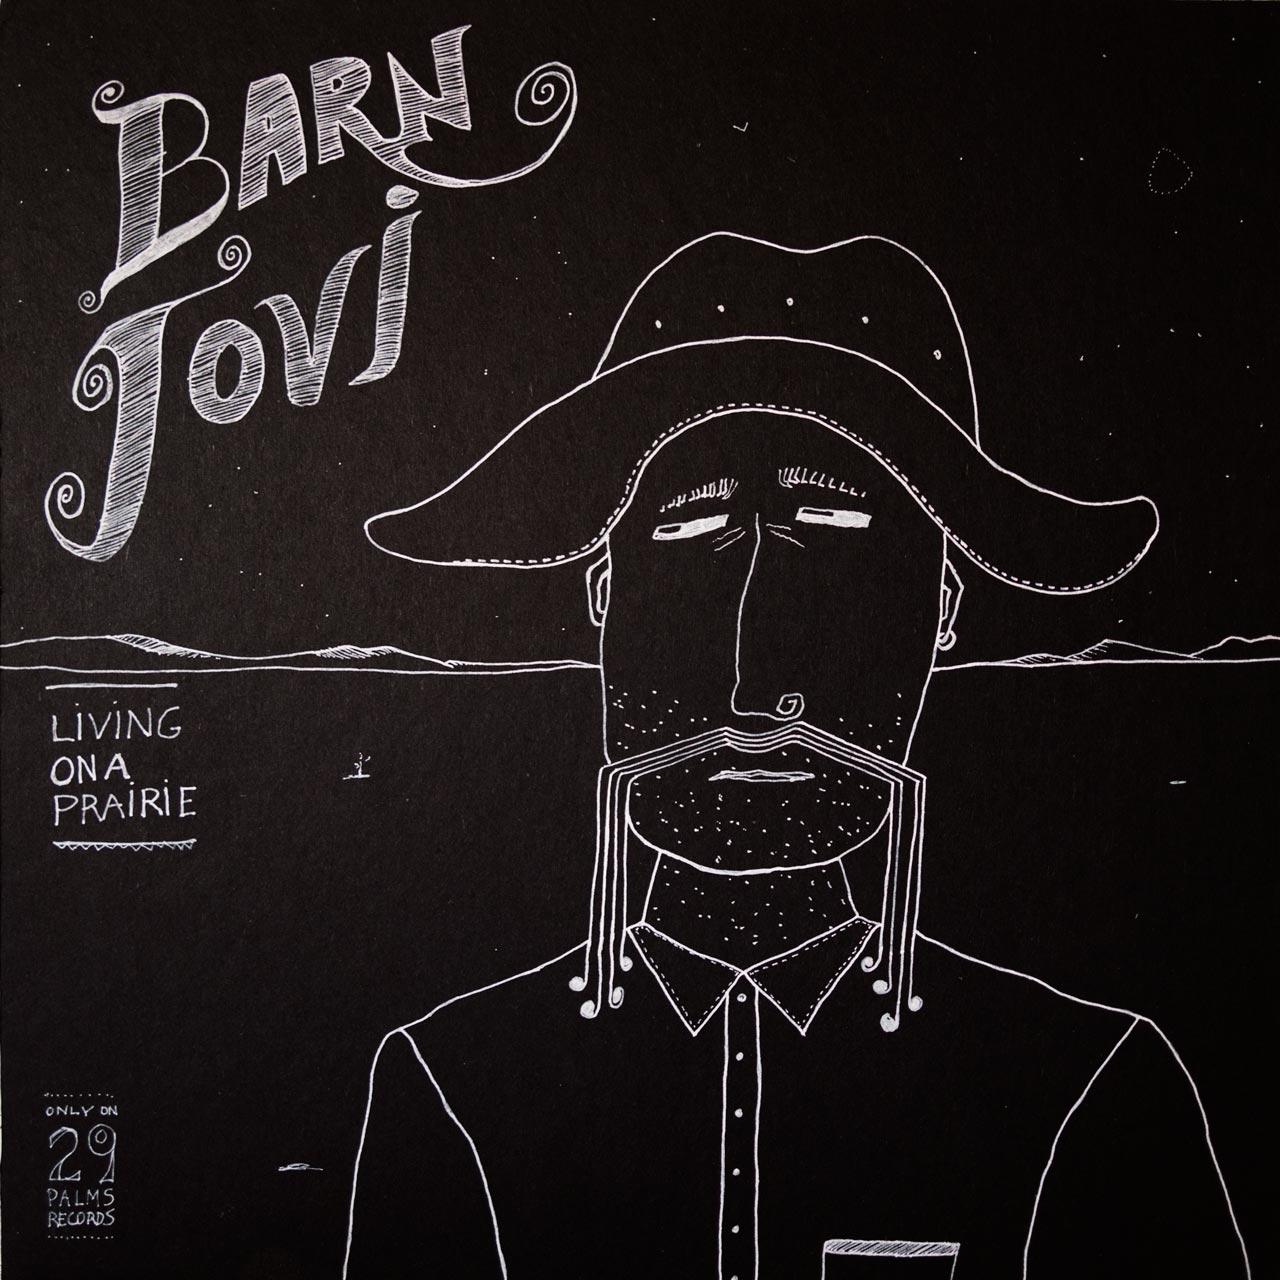 "'Barn Jovi.""12"" x 12"" pen and ink on wood panel."